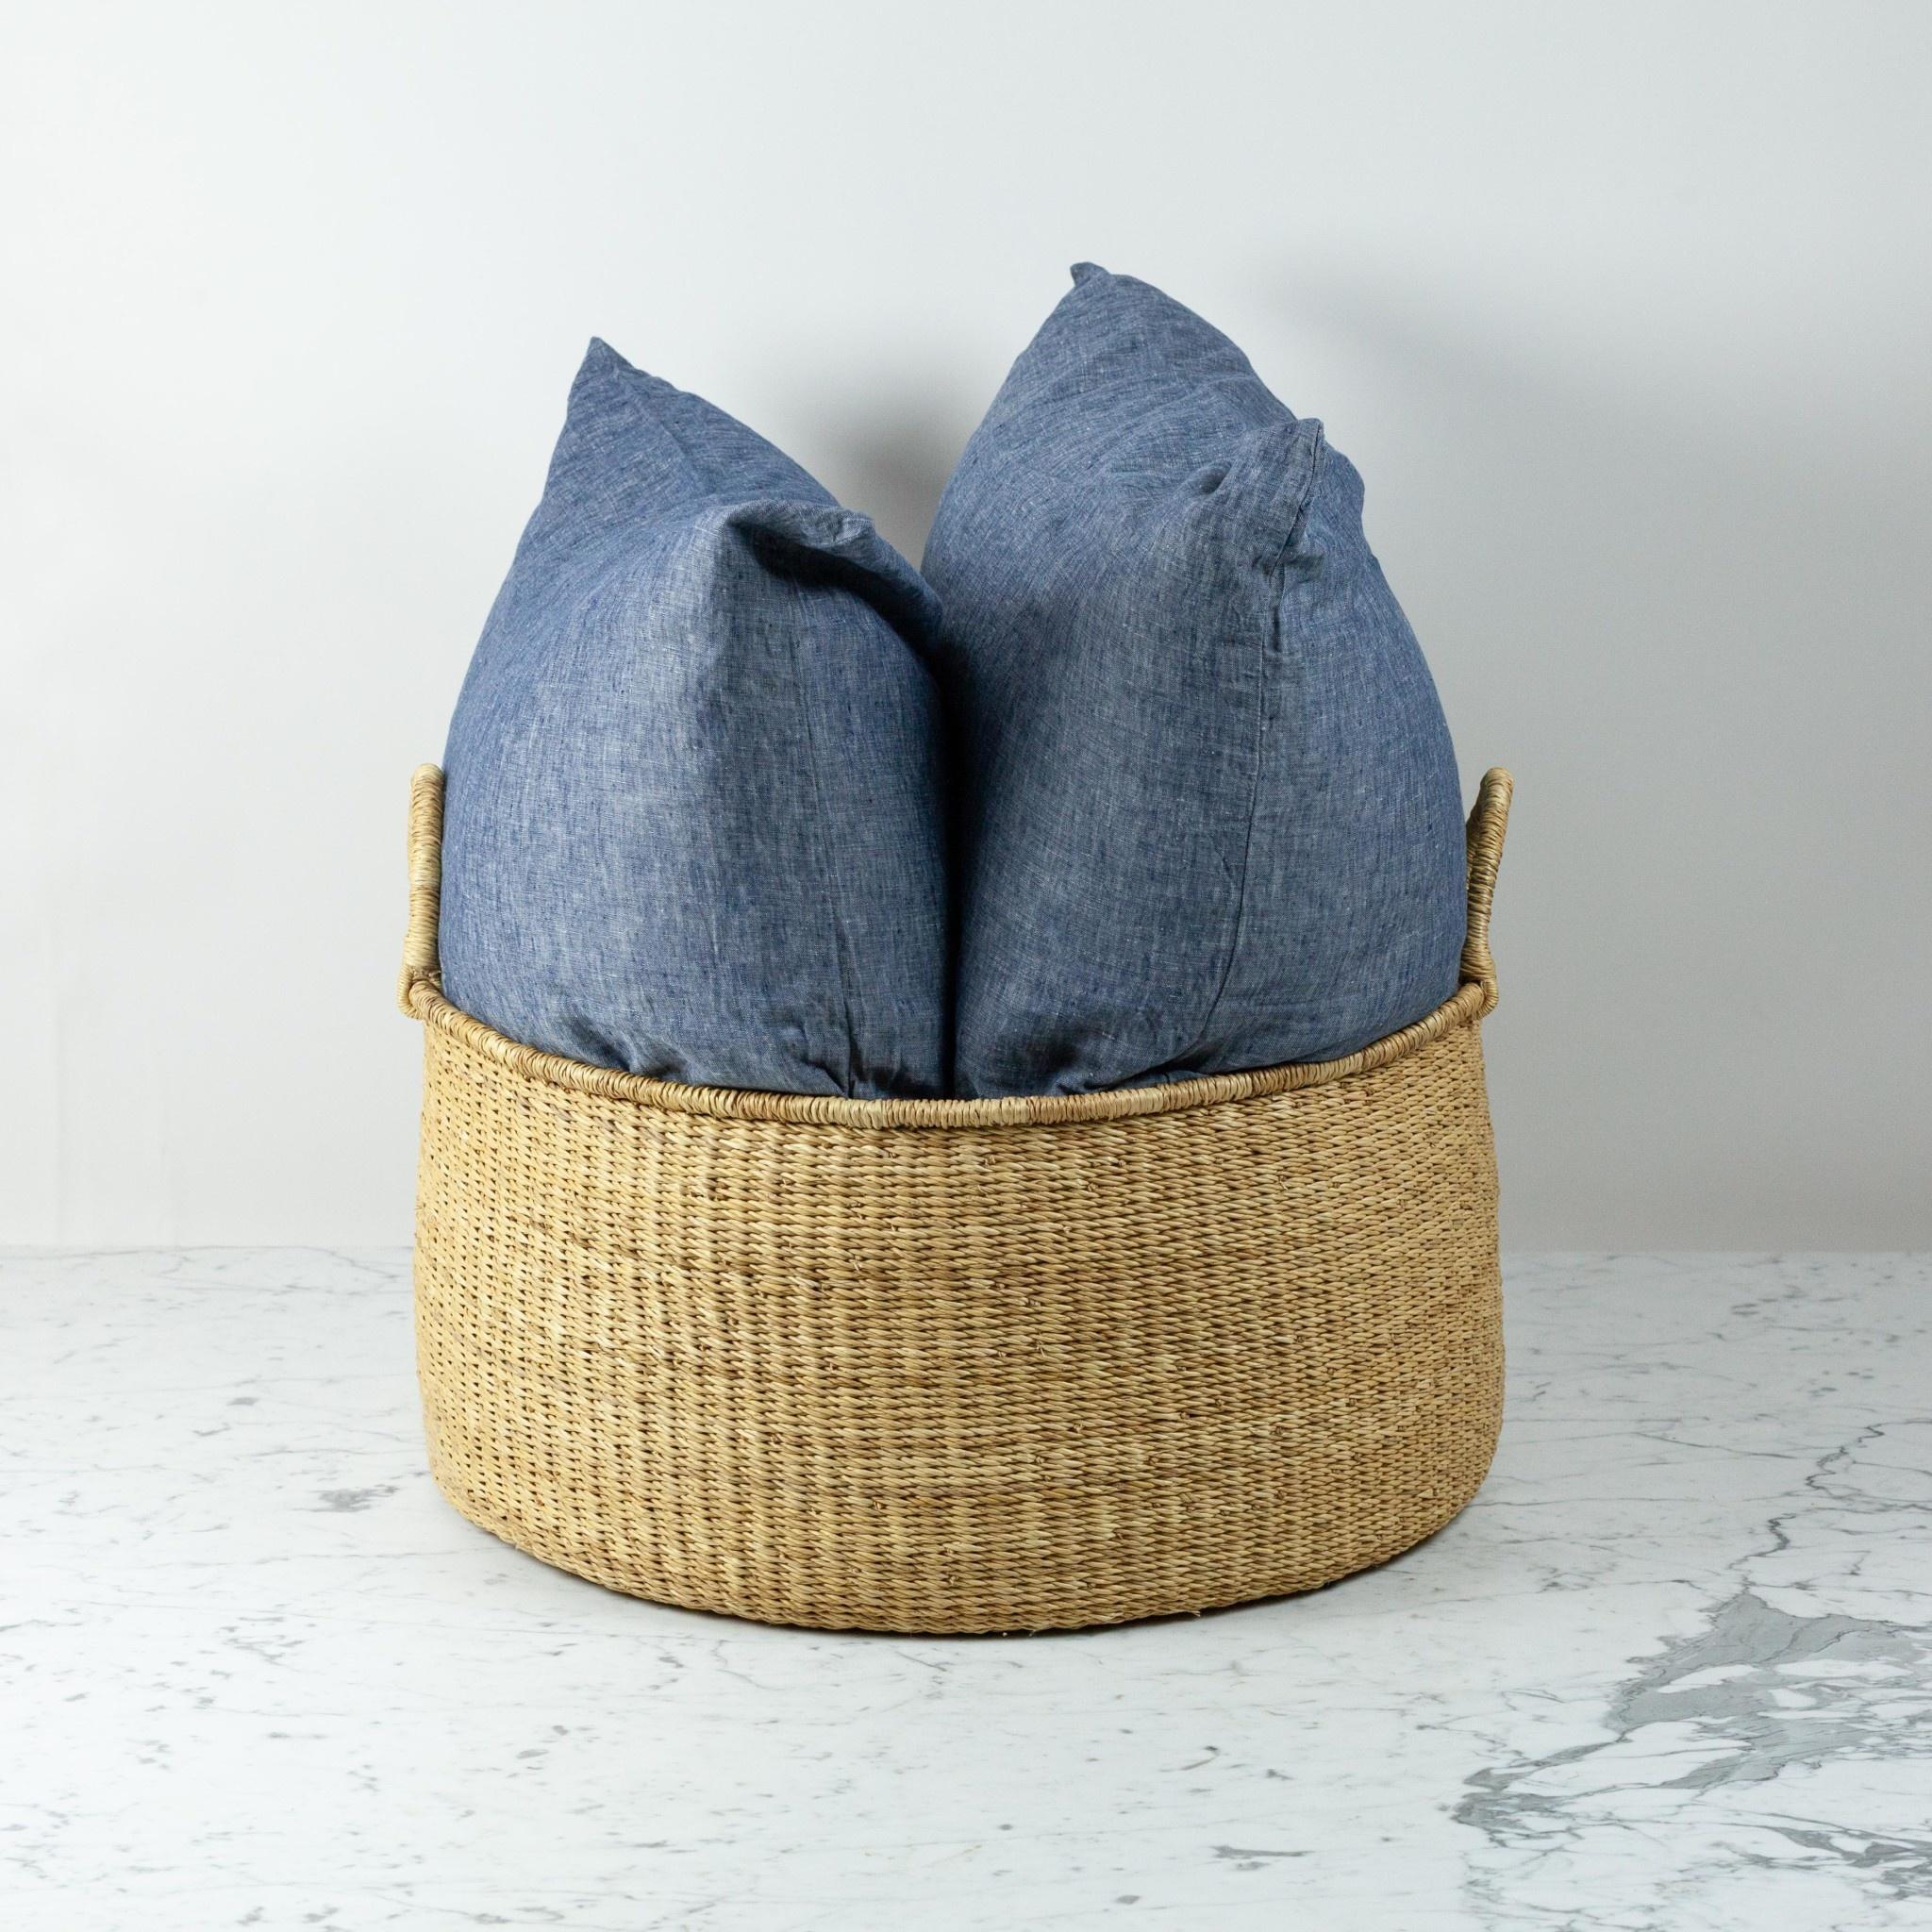 Natural Woven Grass Floor Basket - Large